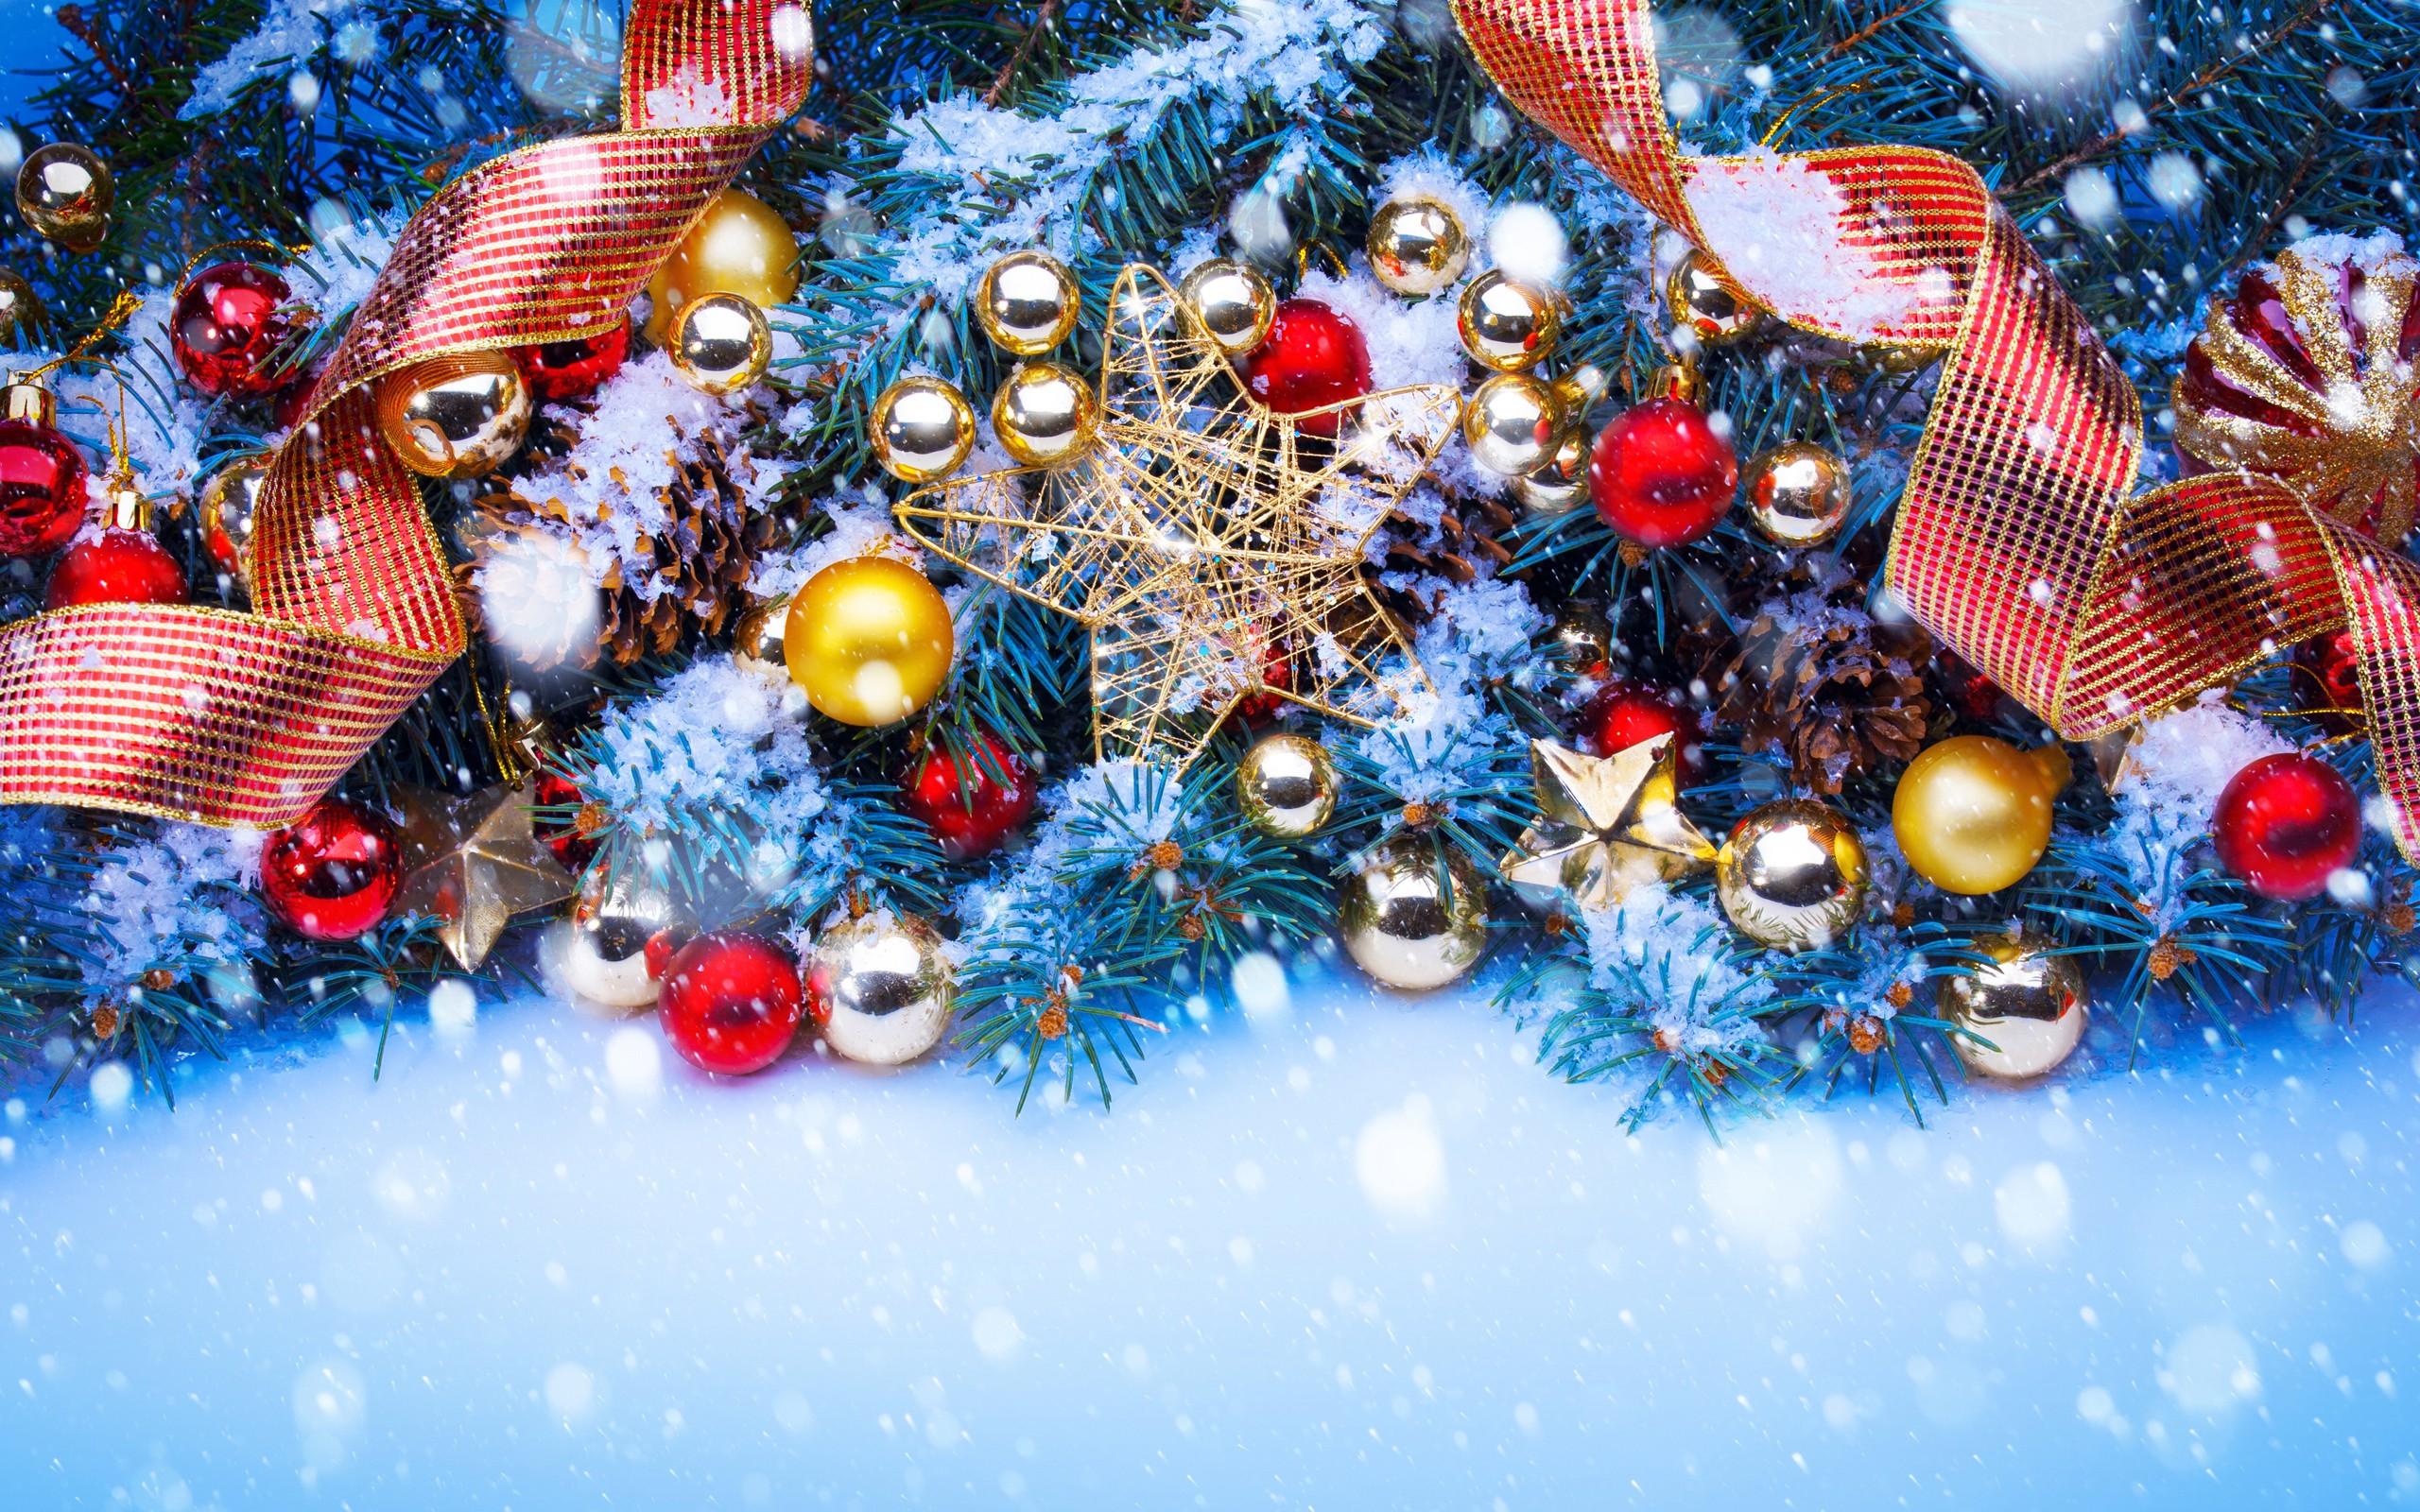 Wallpaper Snow Winter Blue Christmas Tree Christmas Ornaments